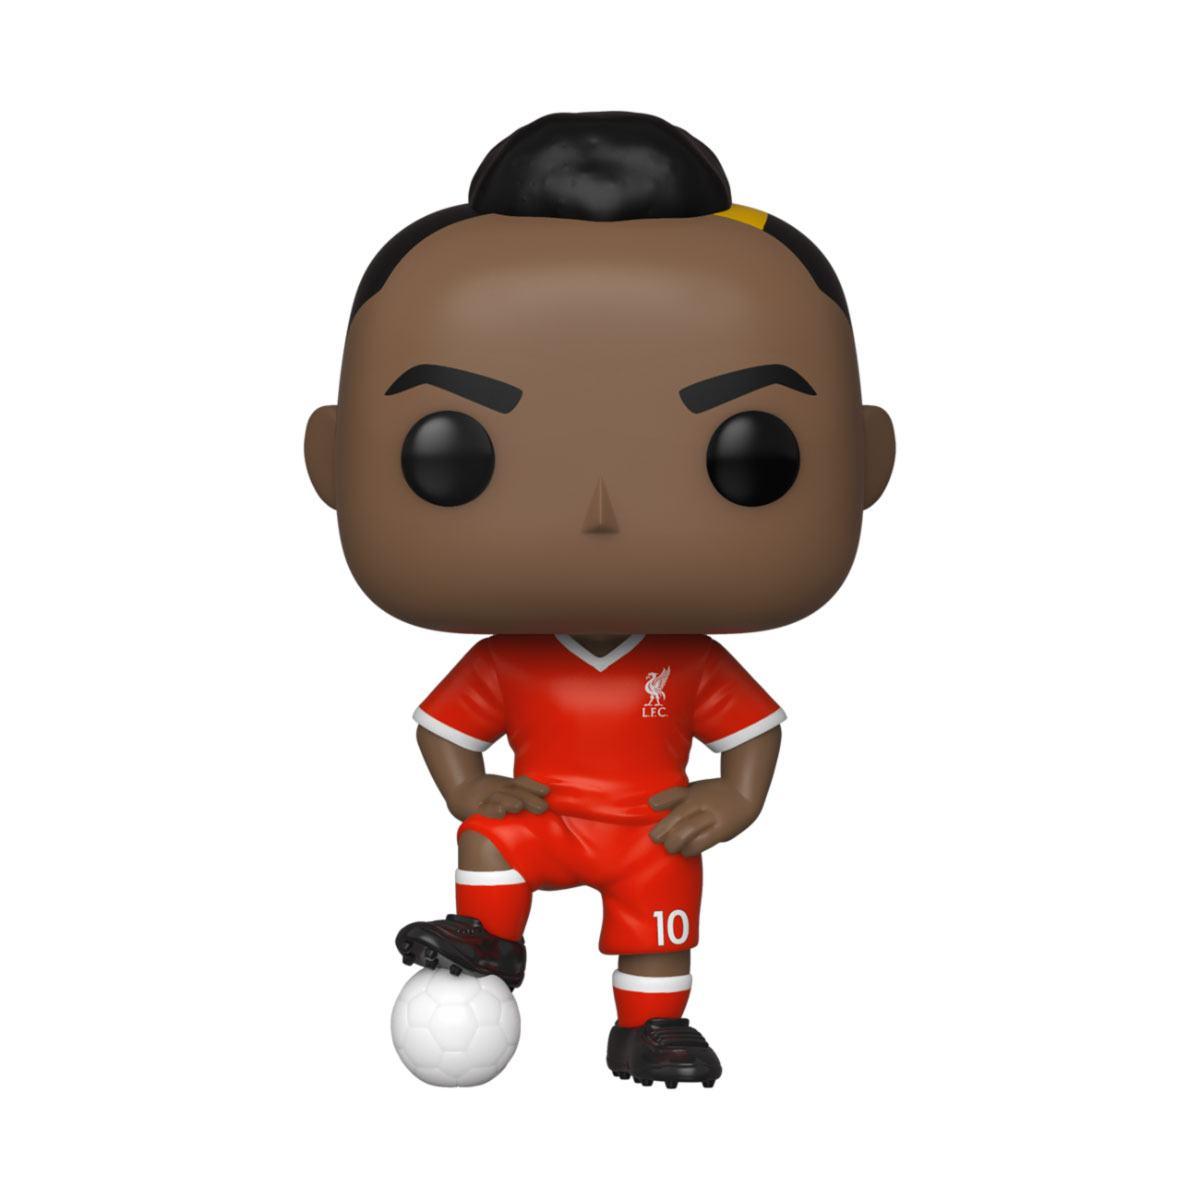 EPL POP! Football Vinyl Figure Sadio Mané (Liverpool) 9 cm